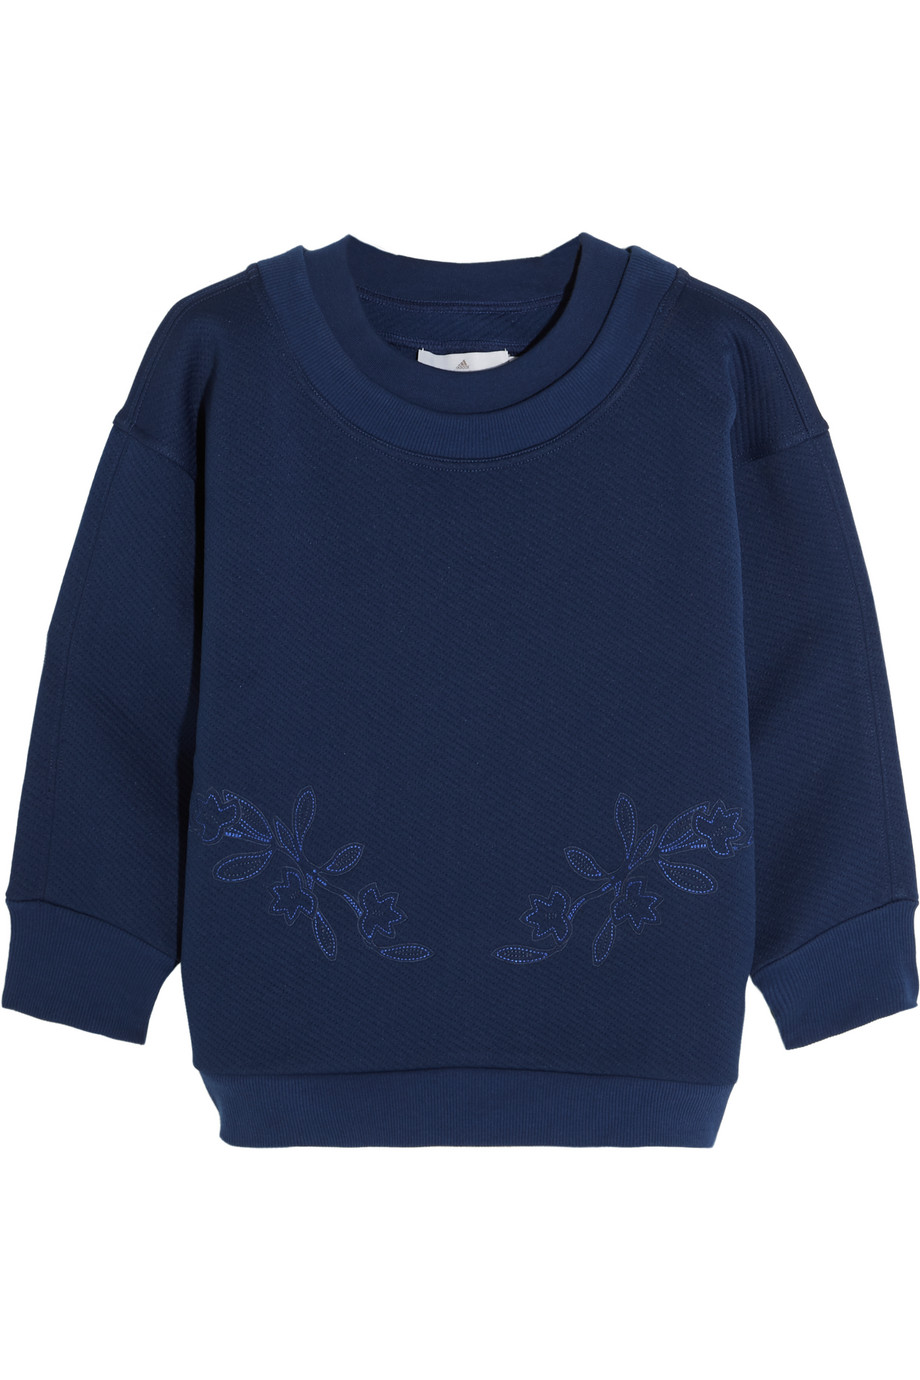 Embroidered Jersey Sweatshirt, Adidas by Stella Mccartney, Navy, Women's, Size: XS